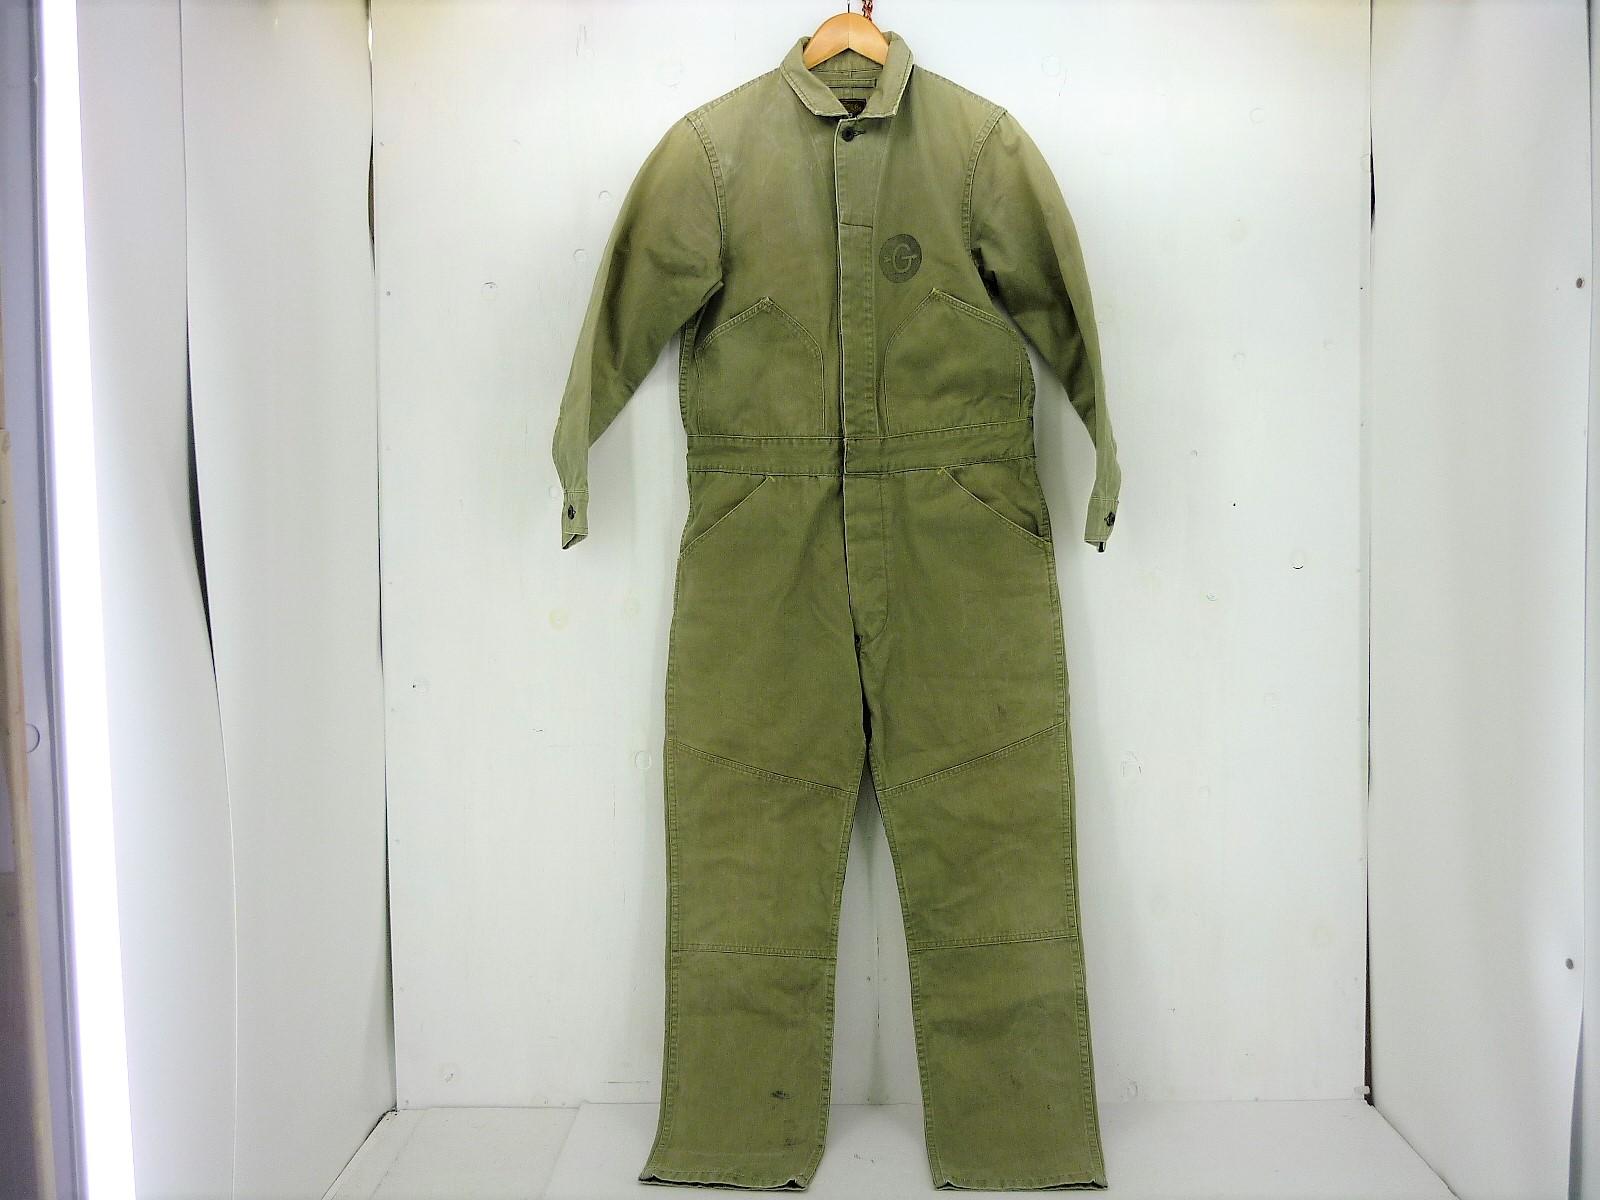 GERUGA ヘリンボーン ジャンプスーツ size:1 ゲルガ オールインワン ツナギ オリーブ